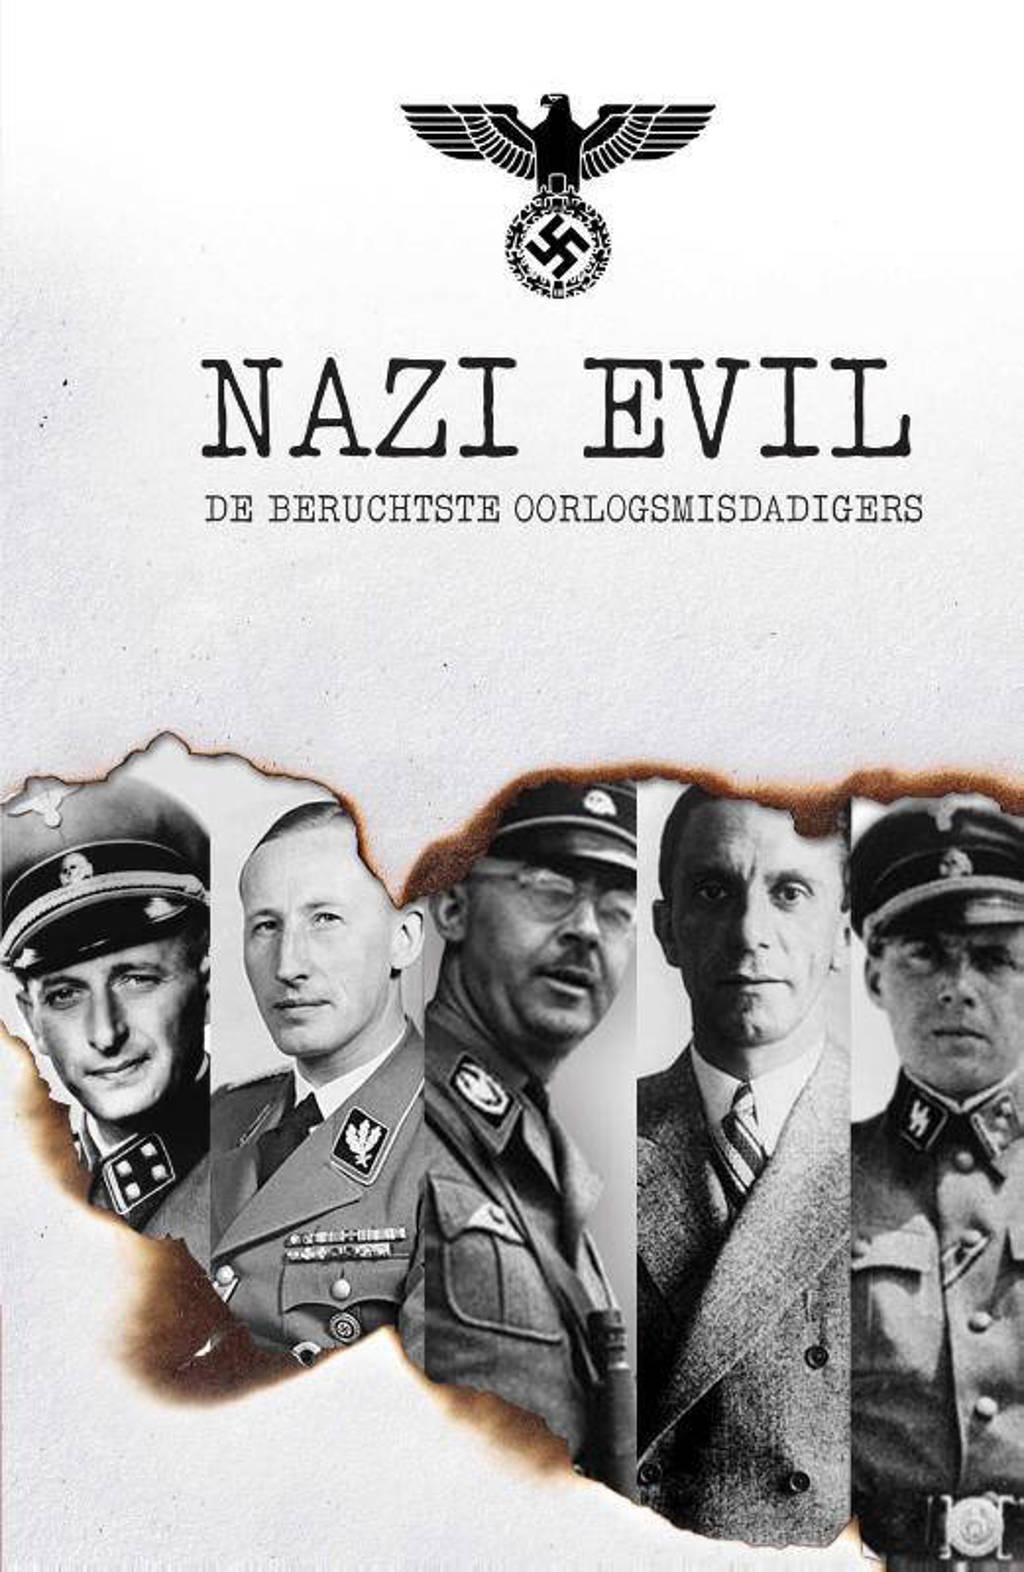 Nazi Evil - Perry Pierik en Mireille Bregman